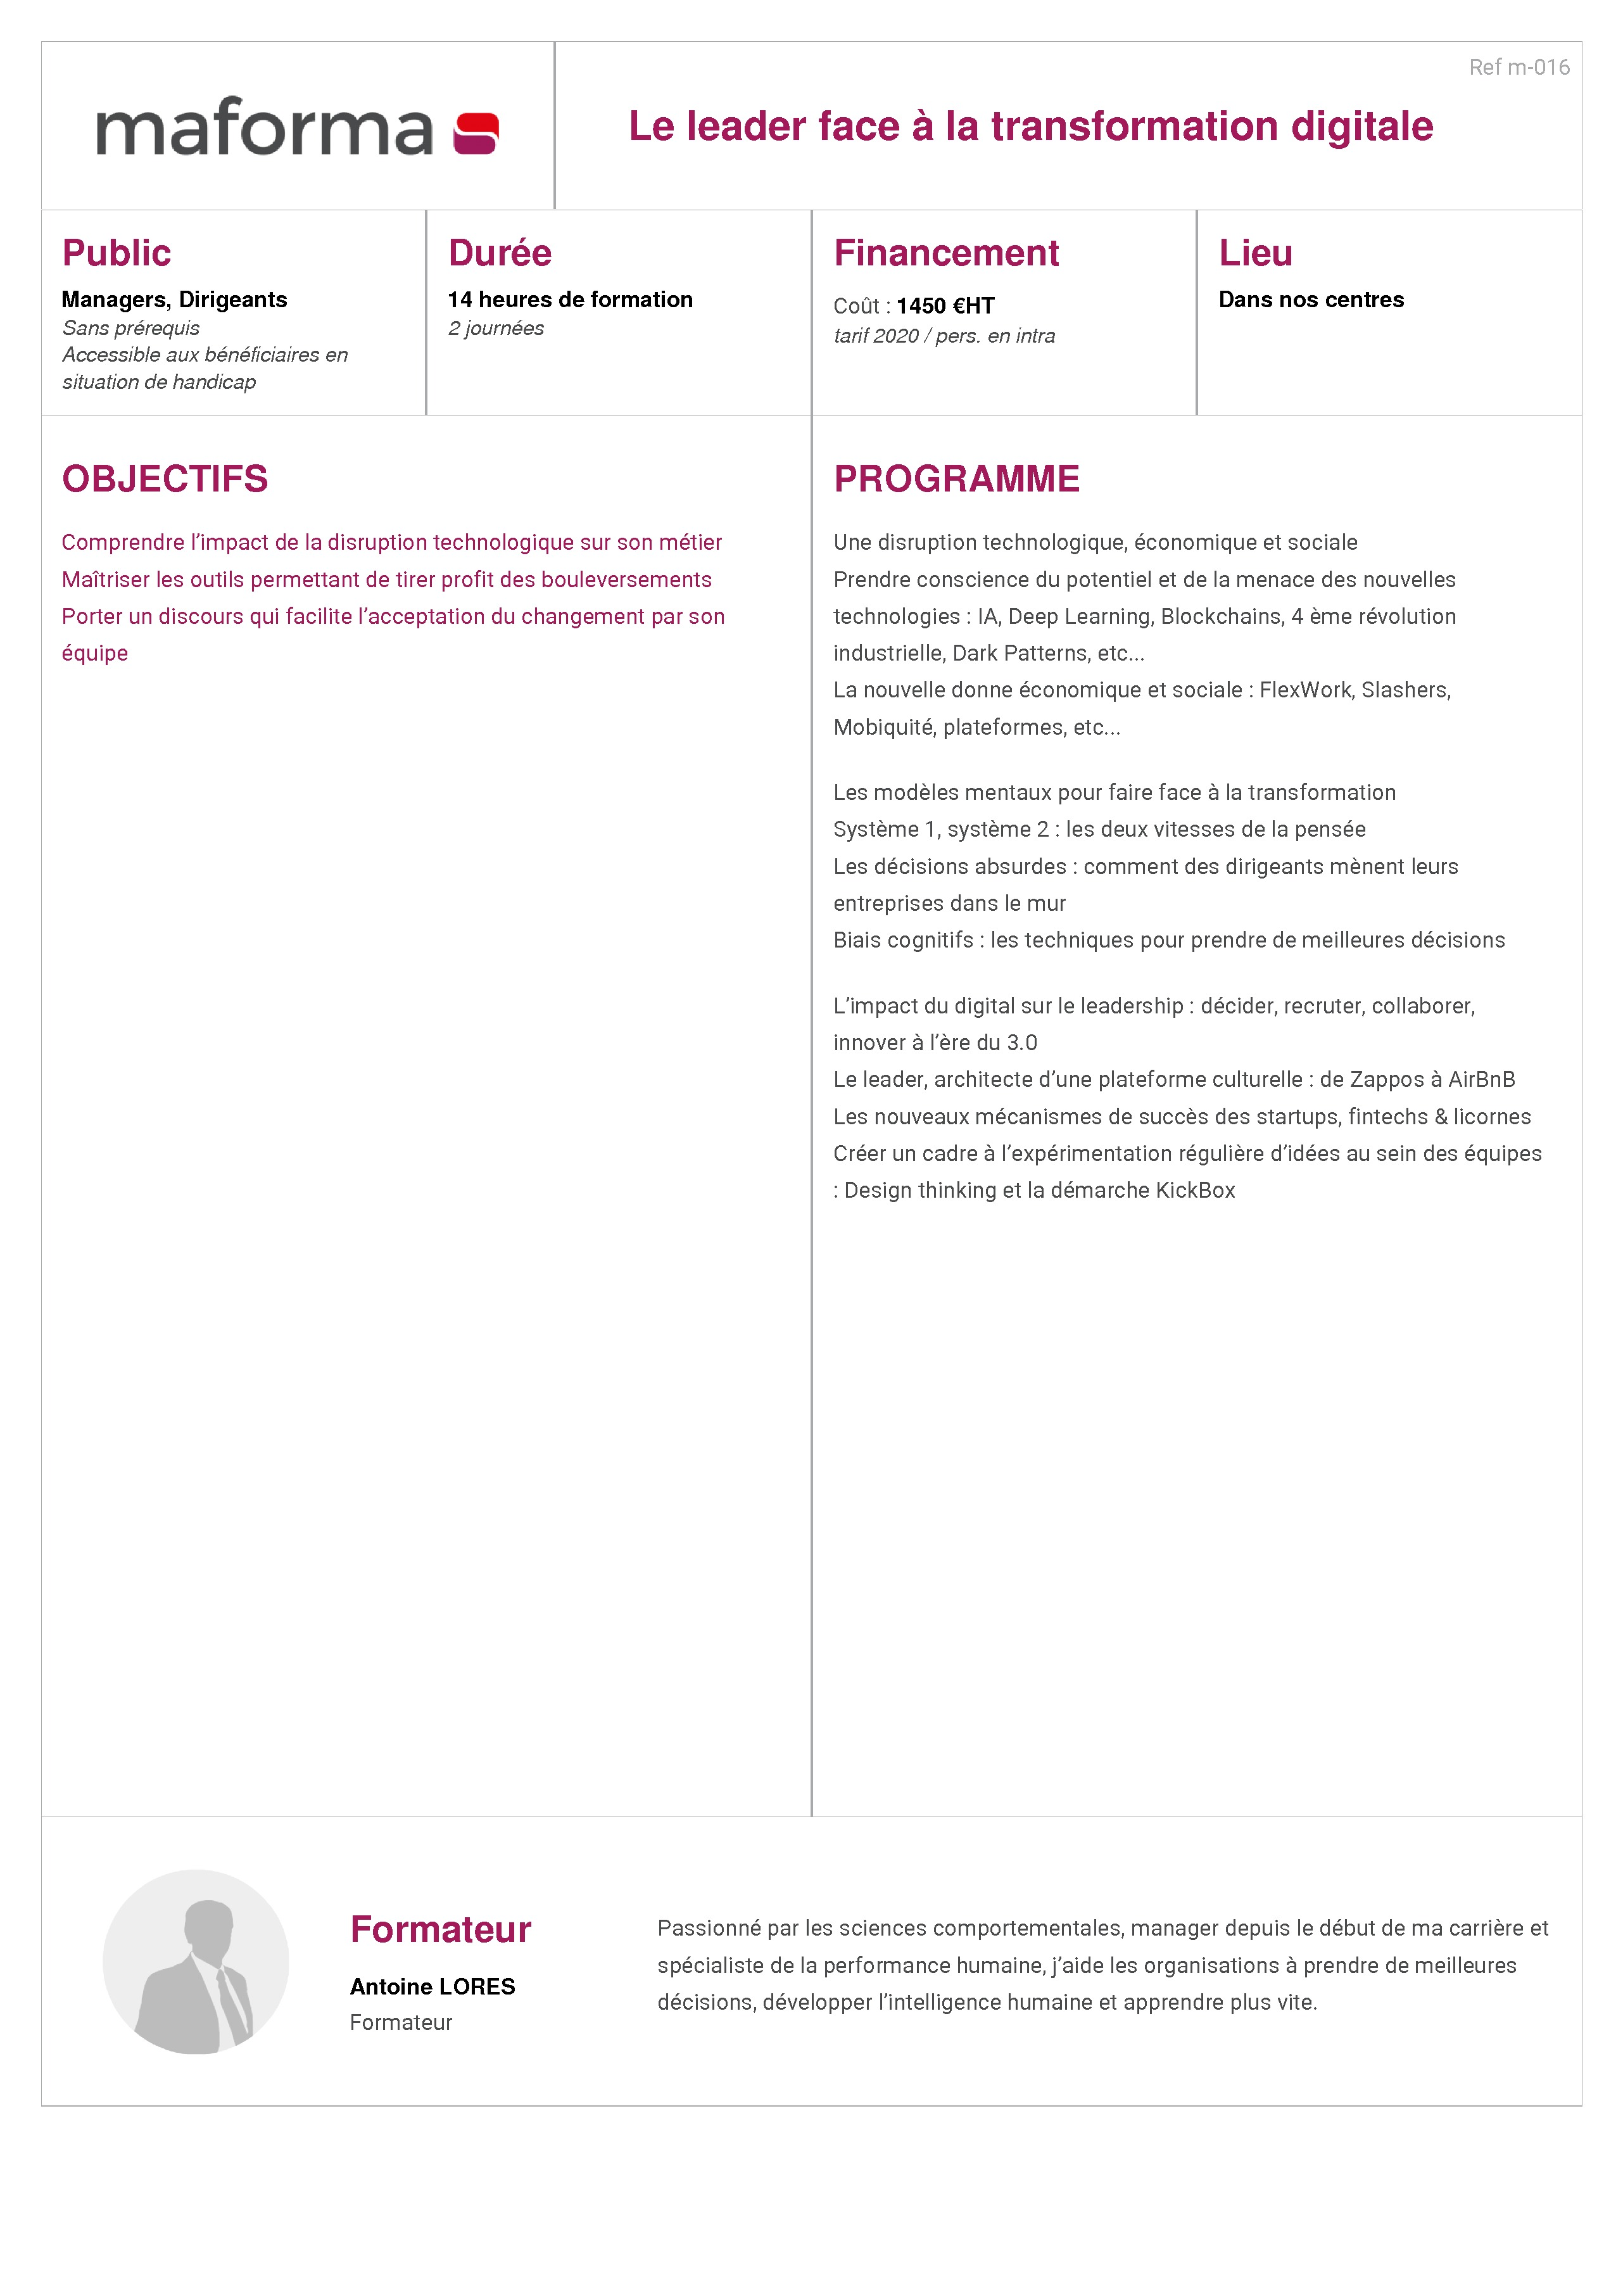 le-leader-face-a-la-transformation-digitale